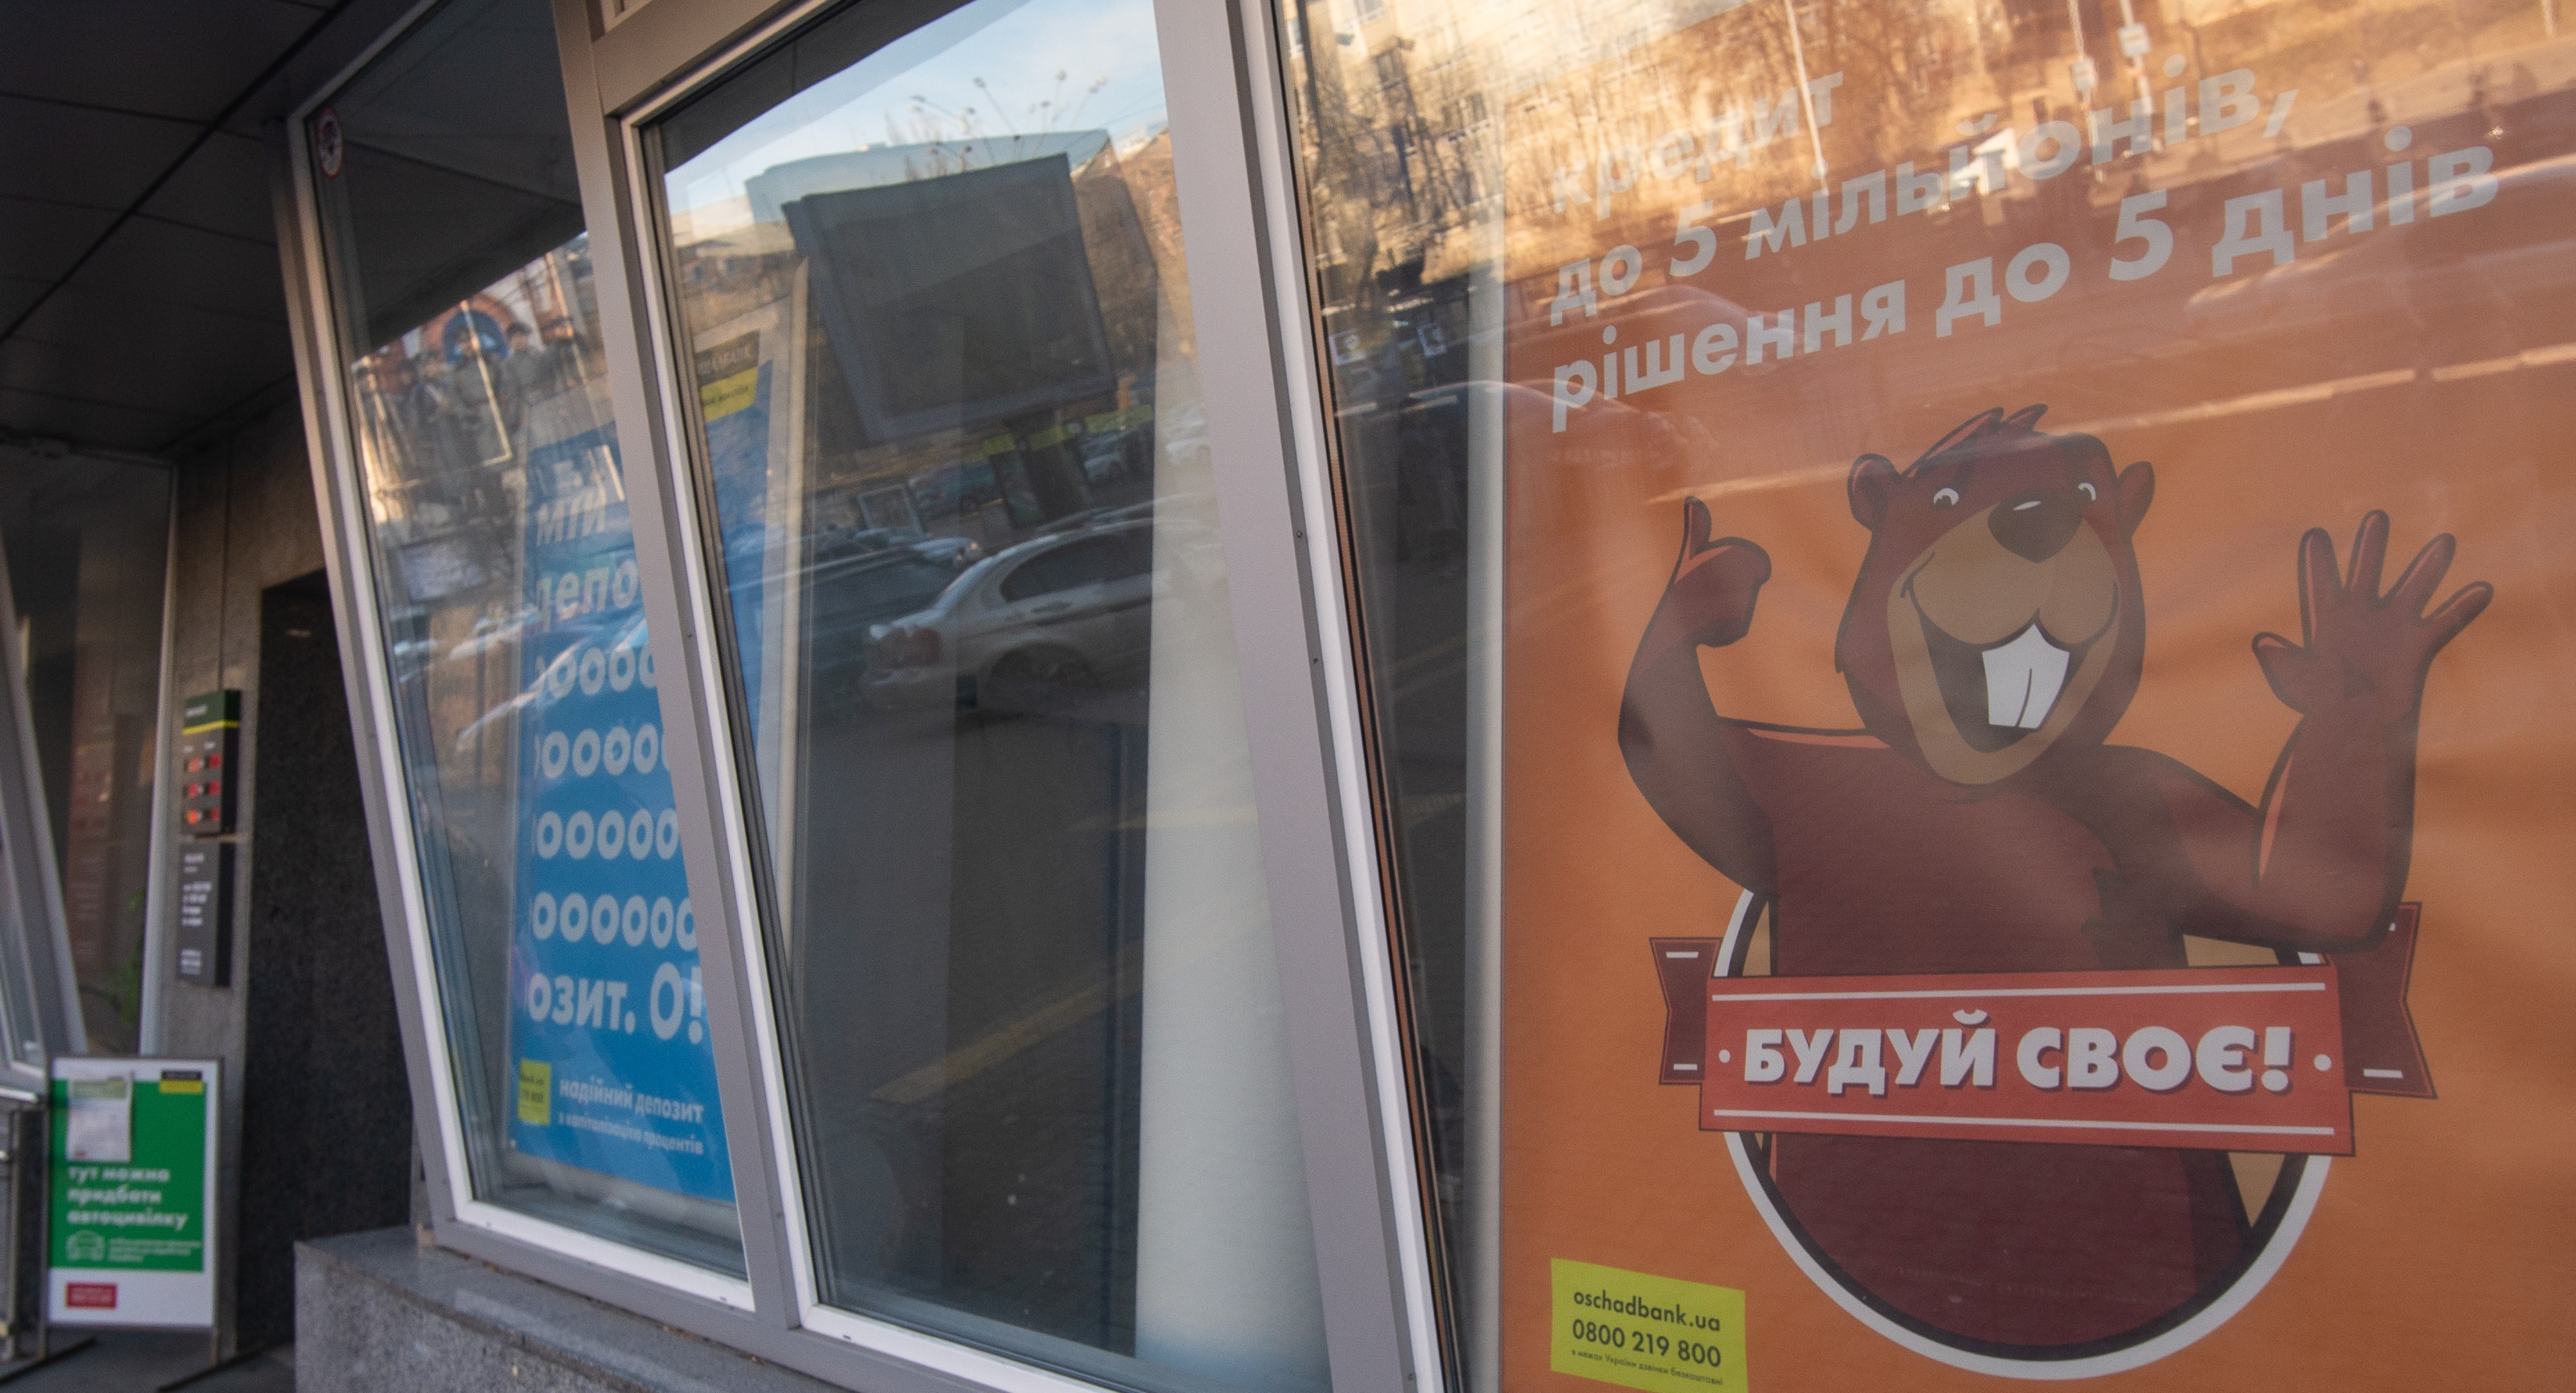 займы до 100 000 рублей срочно на карту без отказа